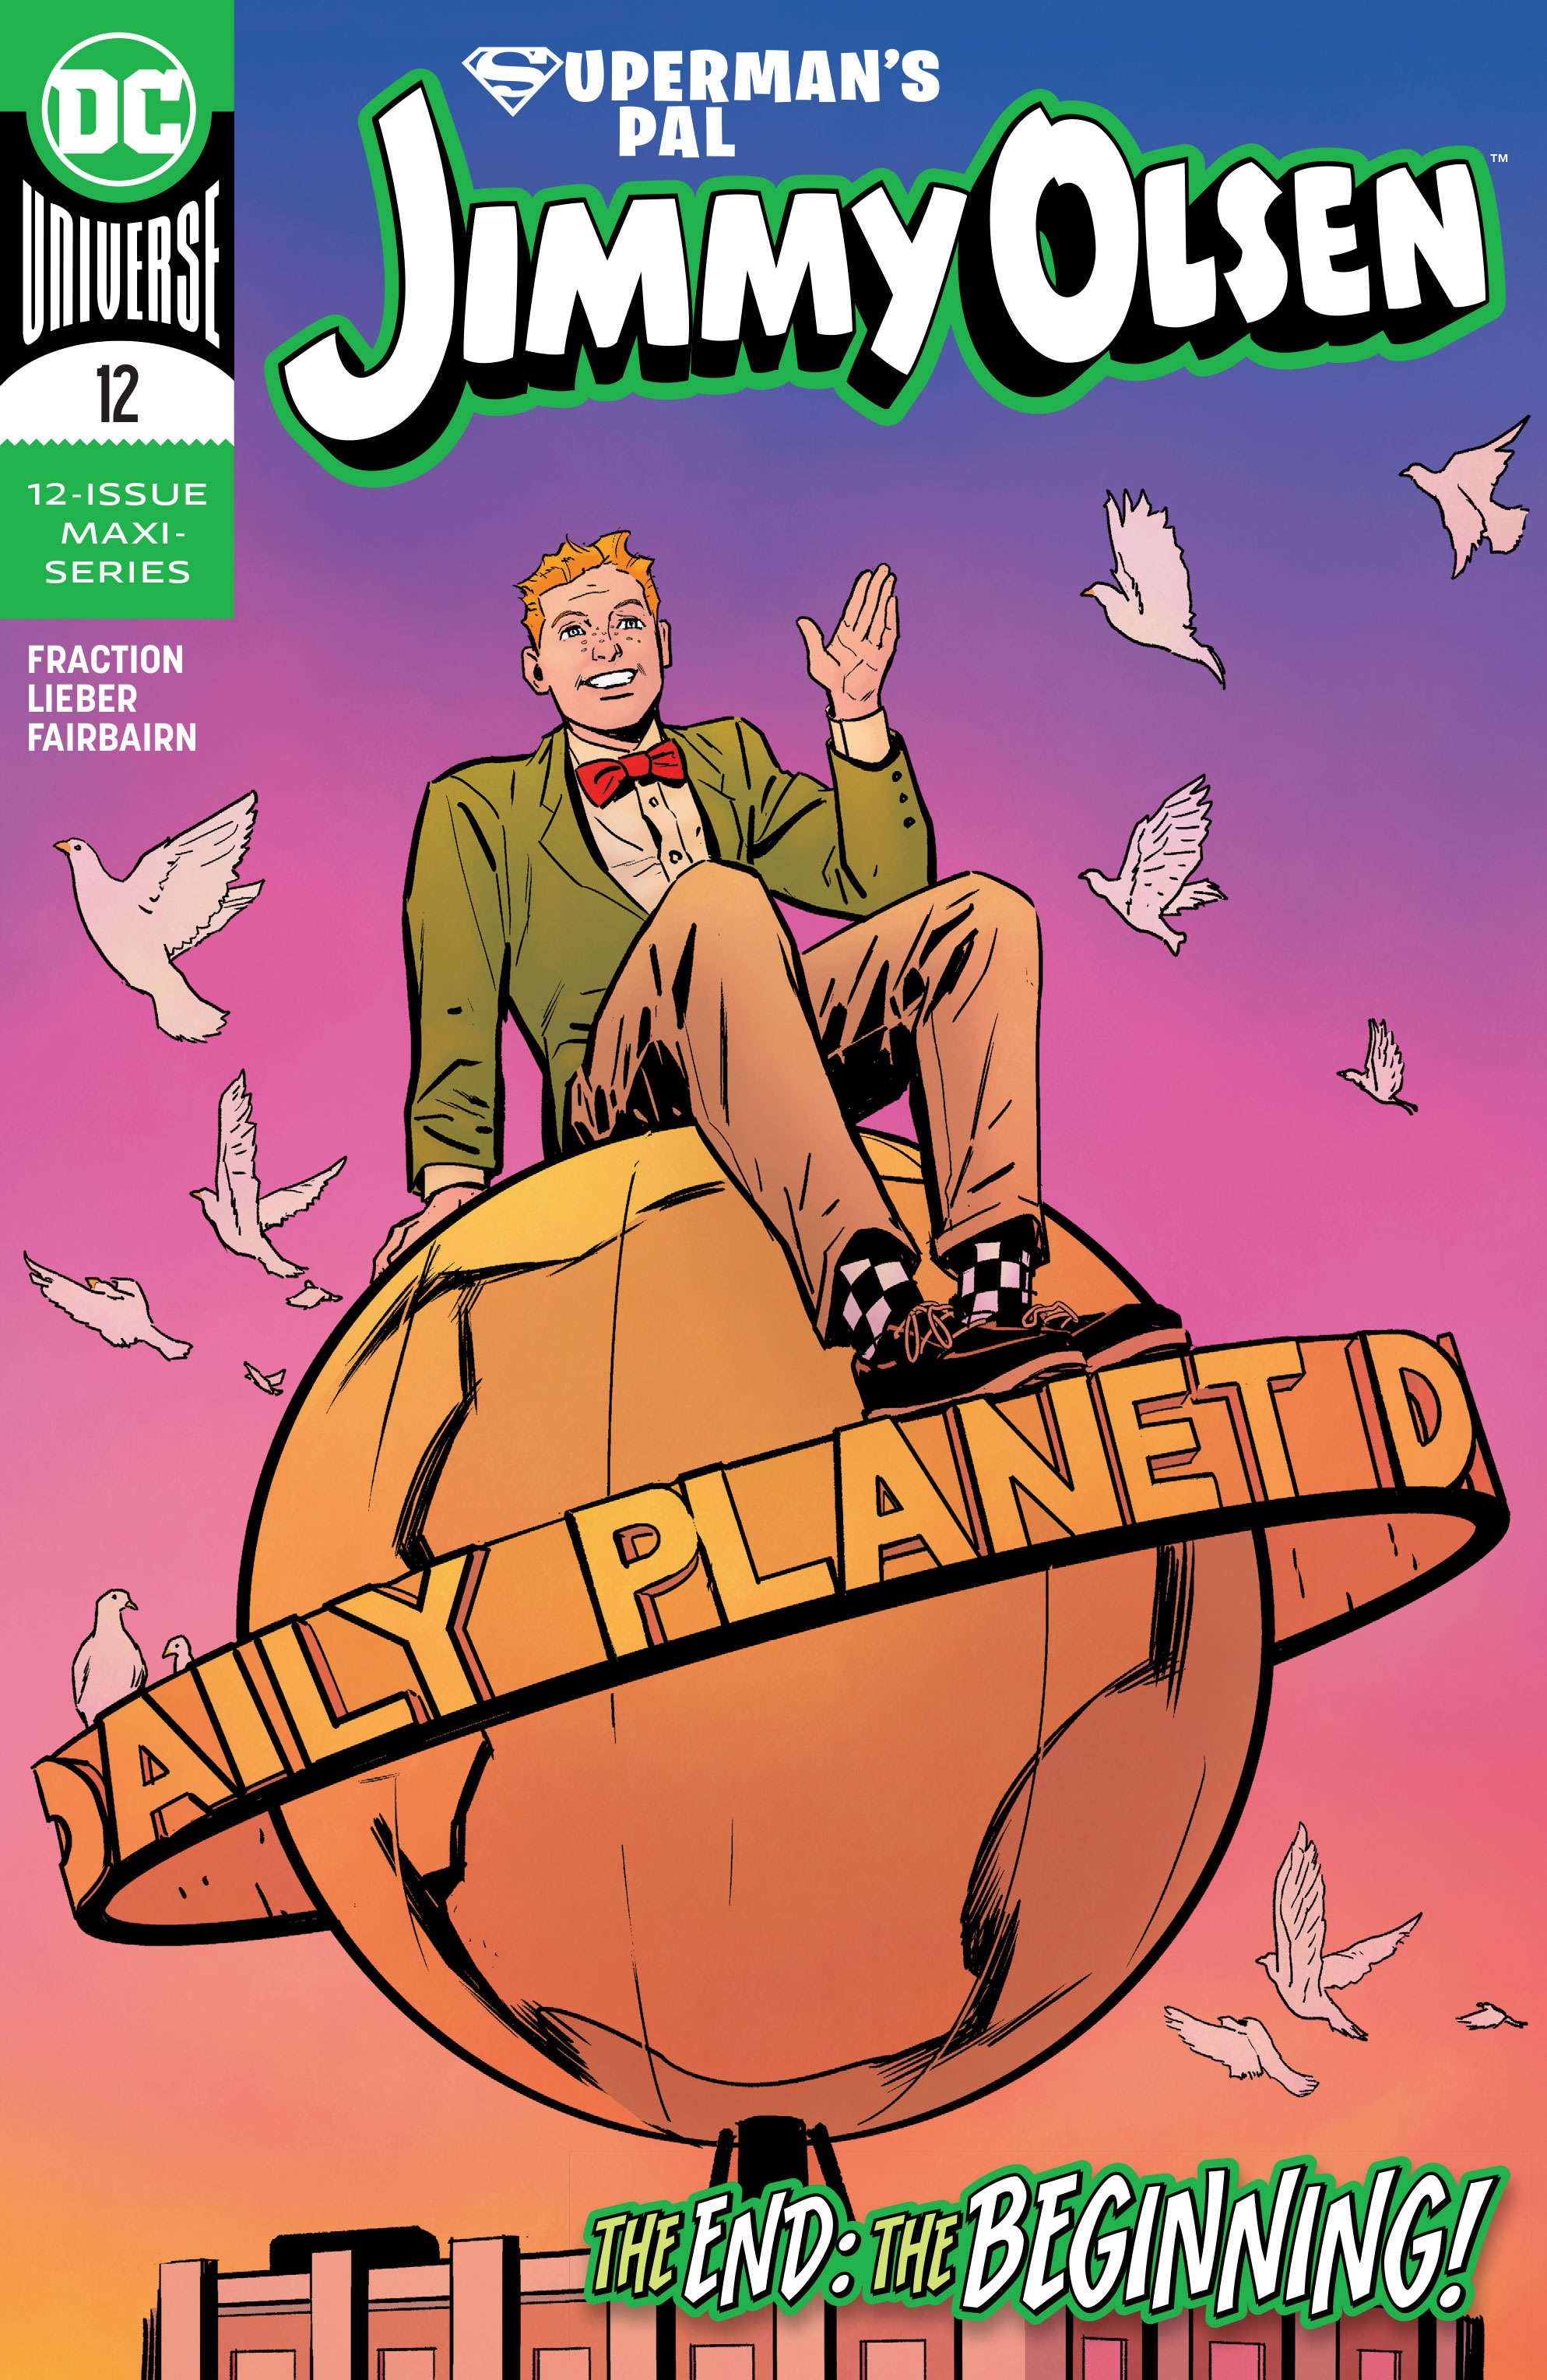 Superman's Pal Jimmy Olsen, James Tynion IV, and more lead 2021 Eisner Awards